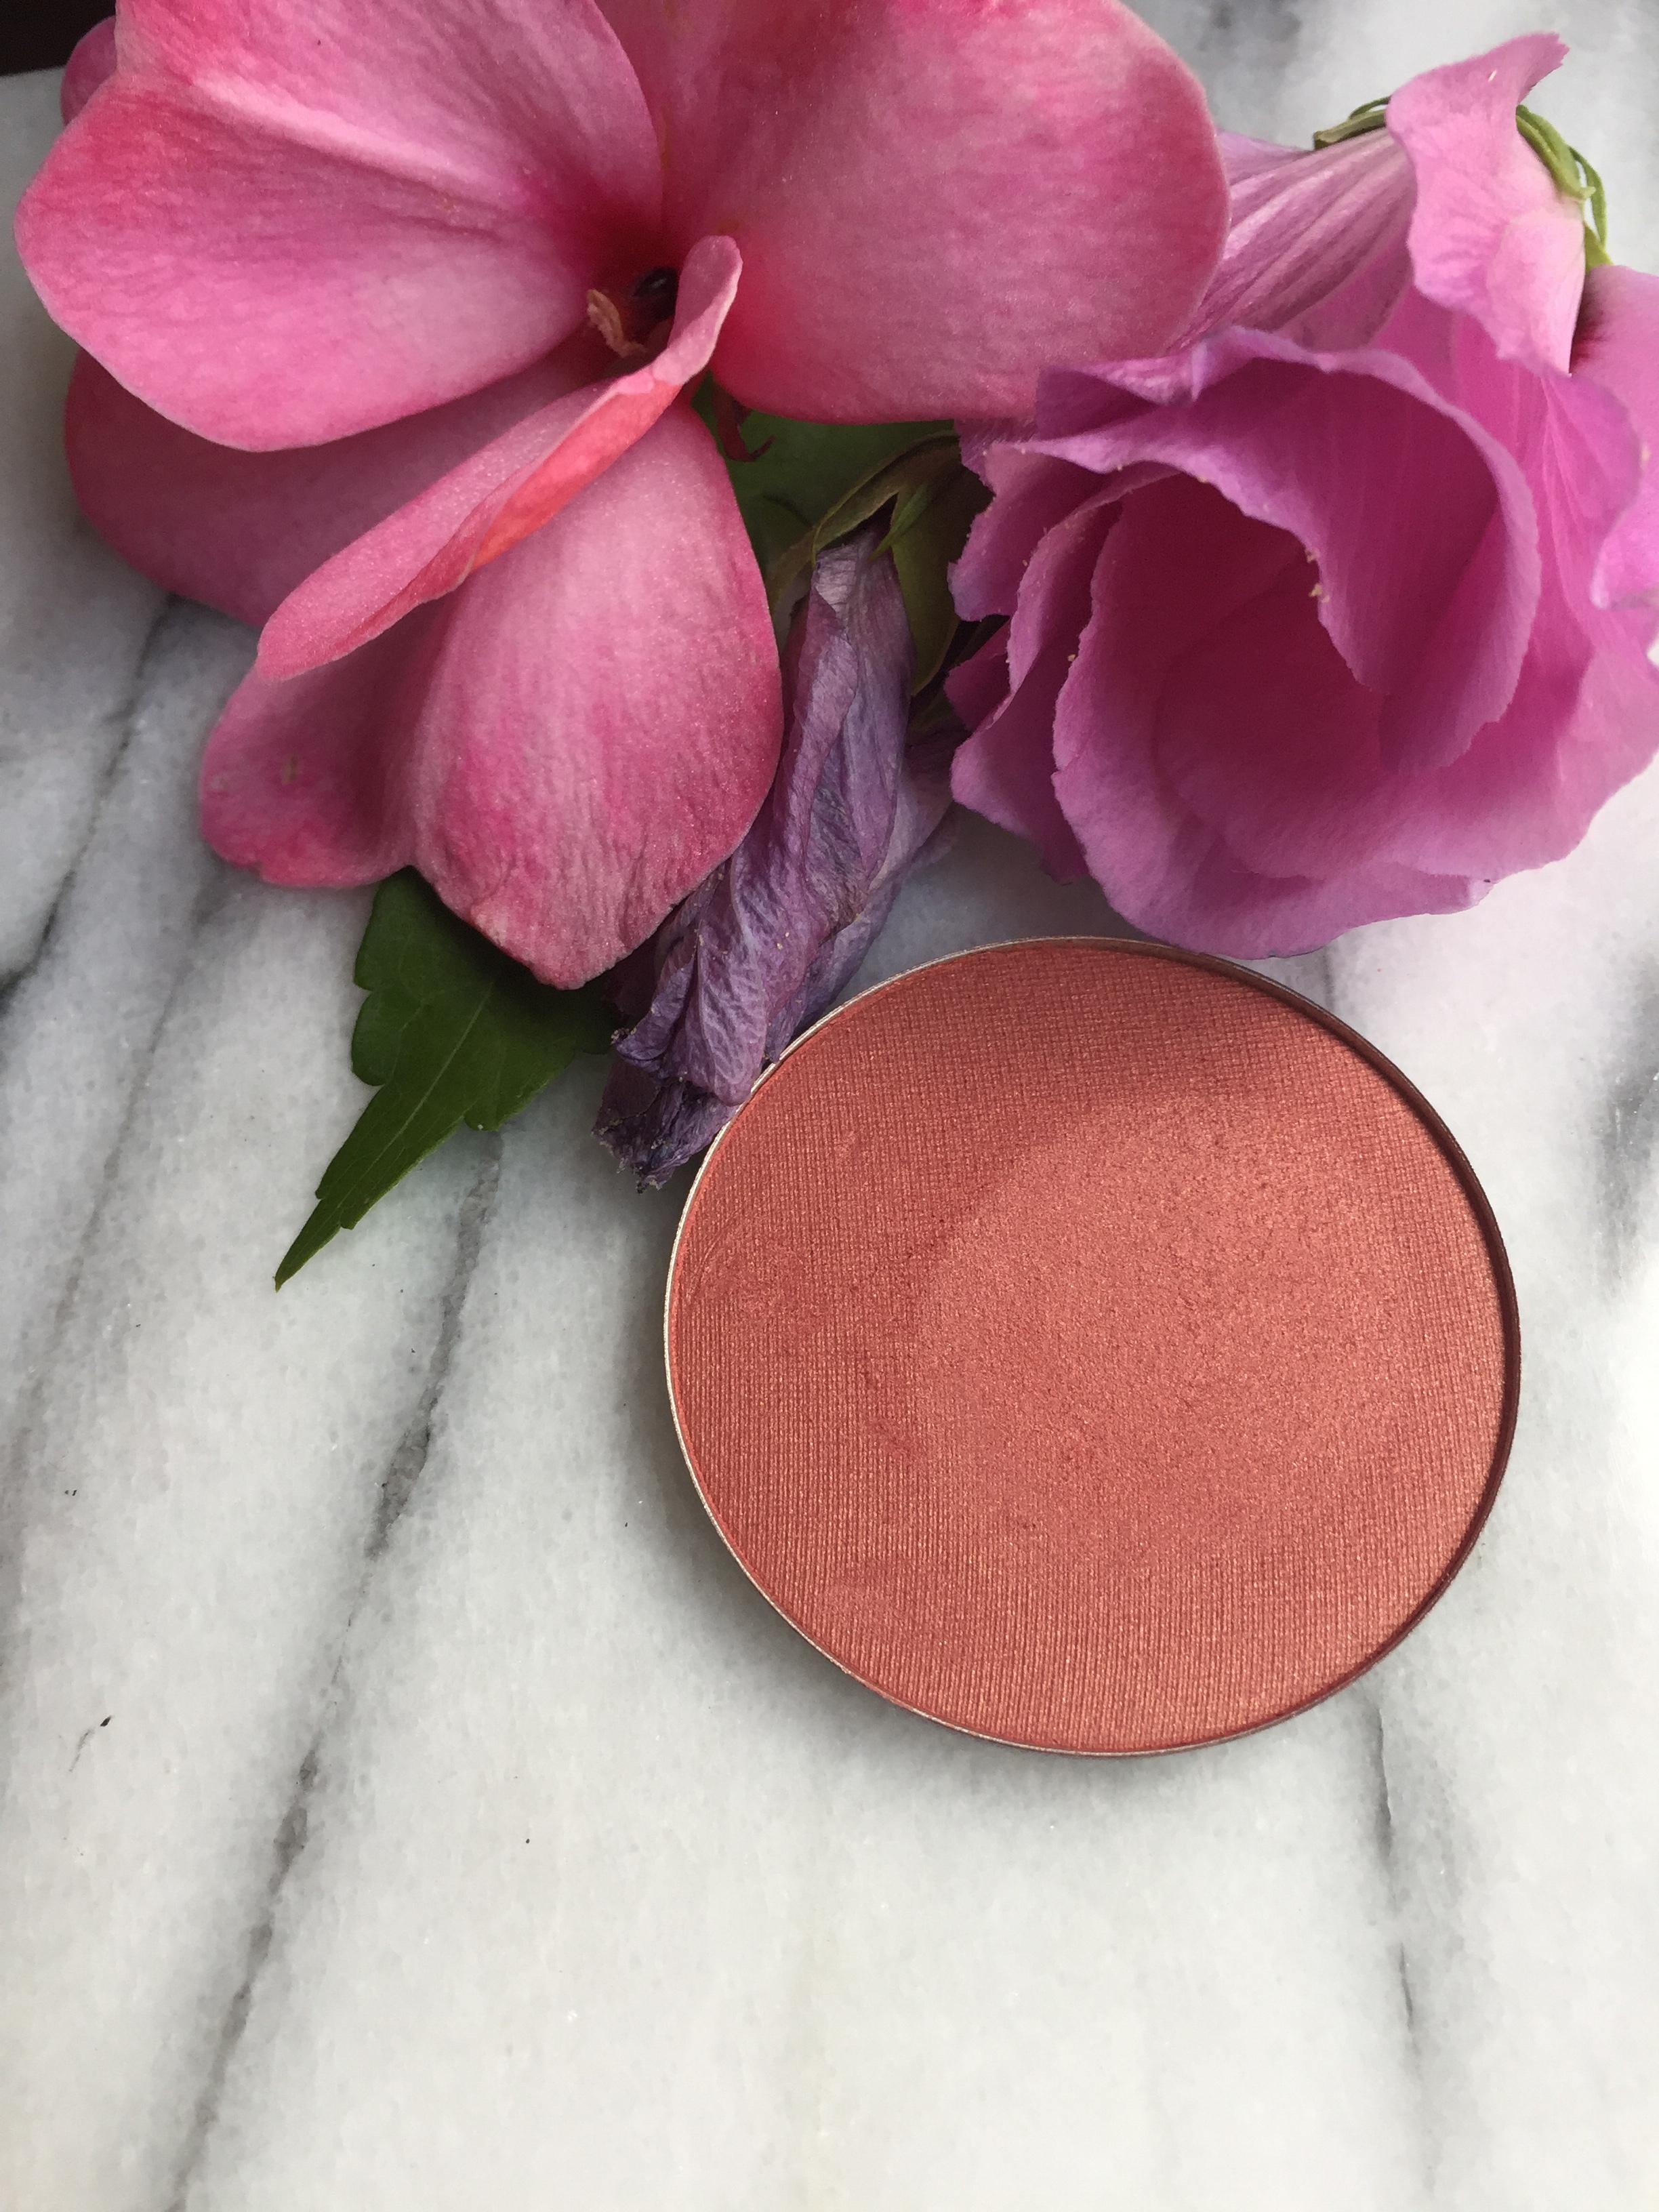 Mauve Blush | Makeup Geek Covet